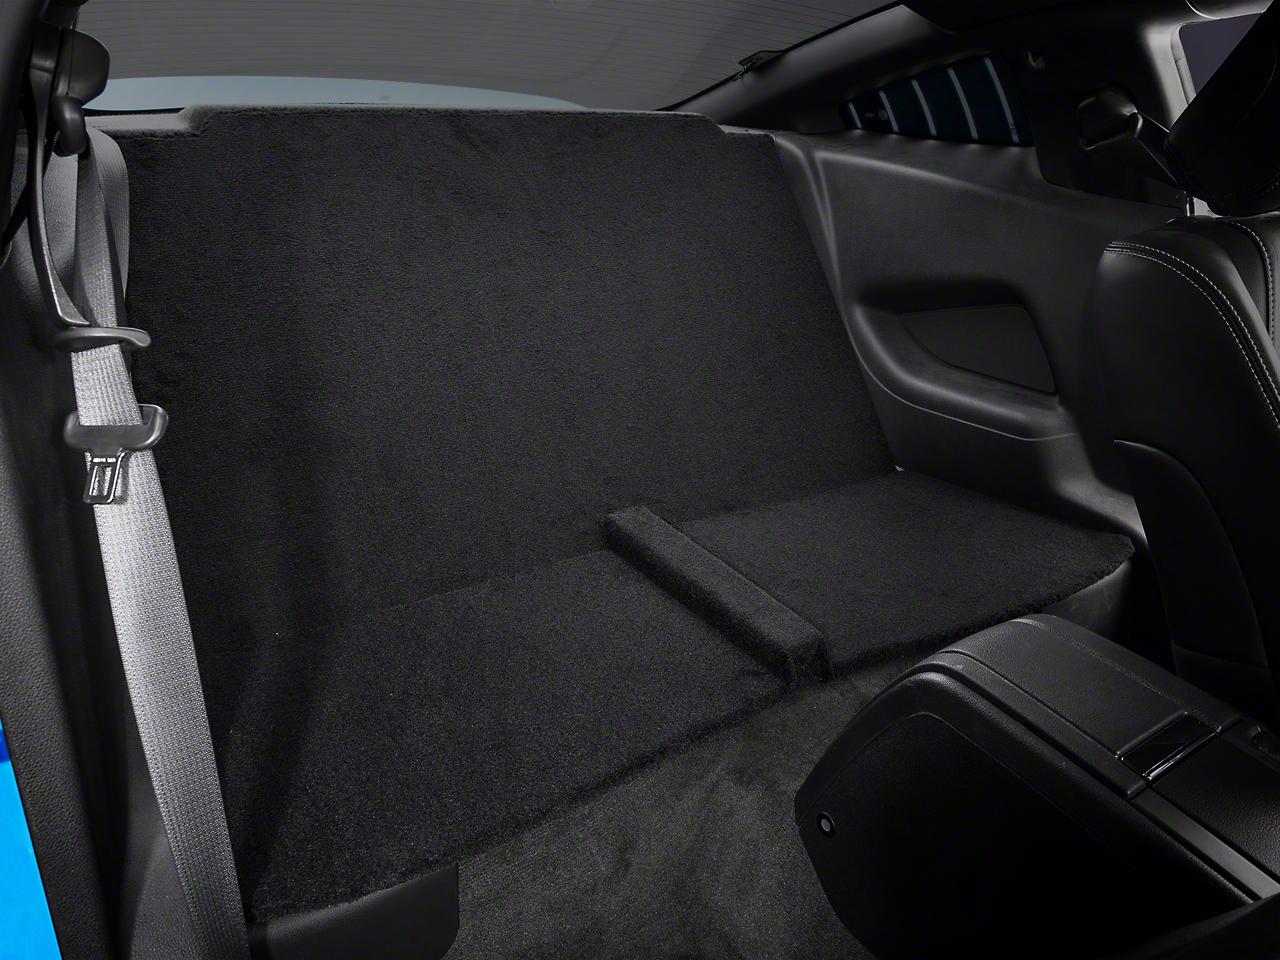 Alterum Rear Seat Delete - Black (11-14 Coupe)